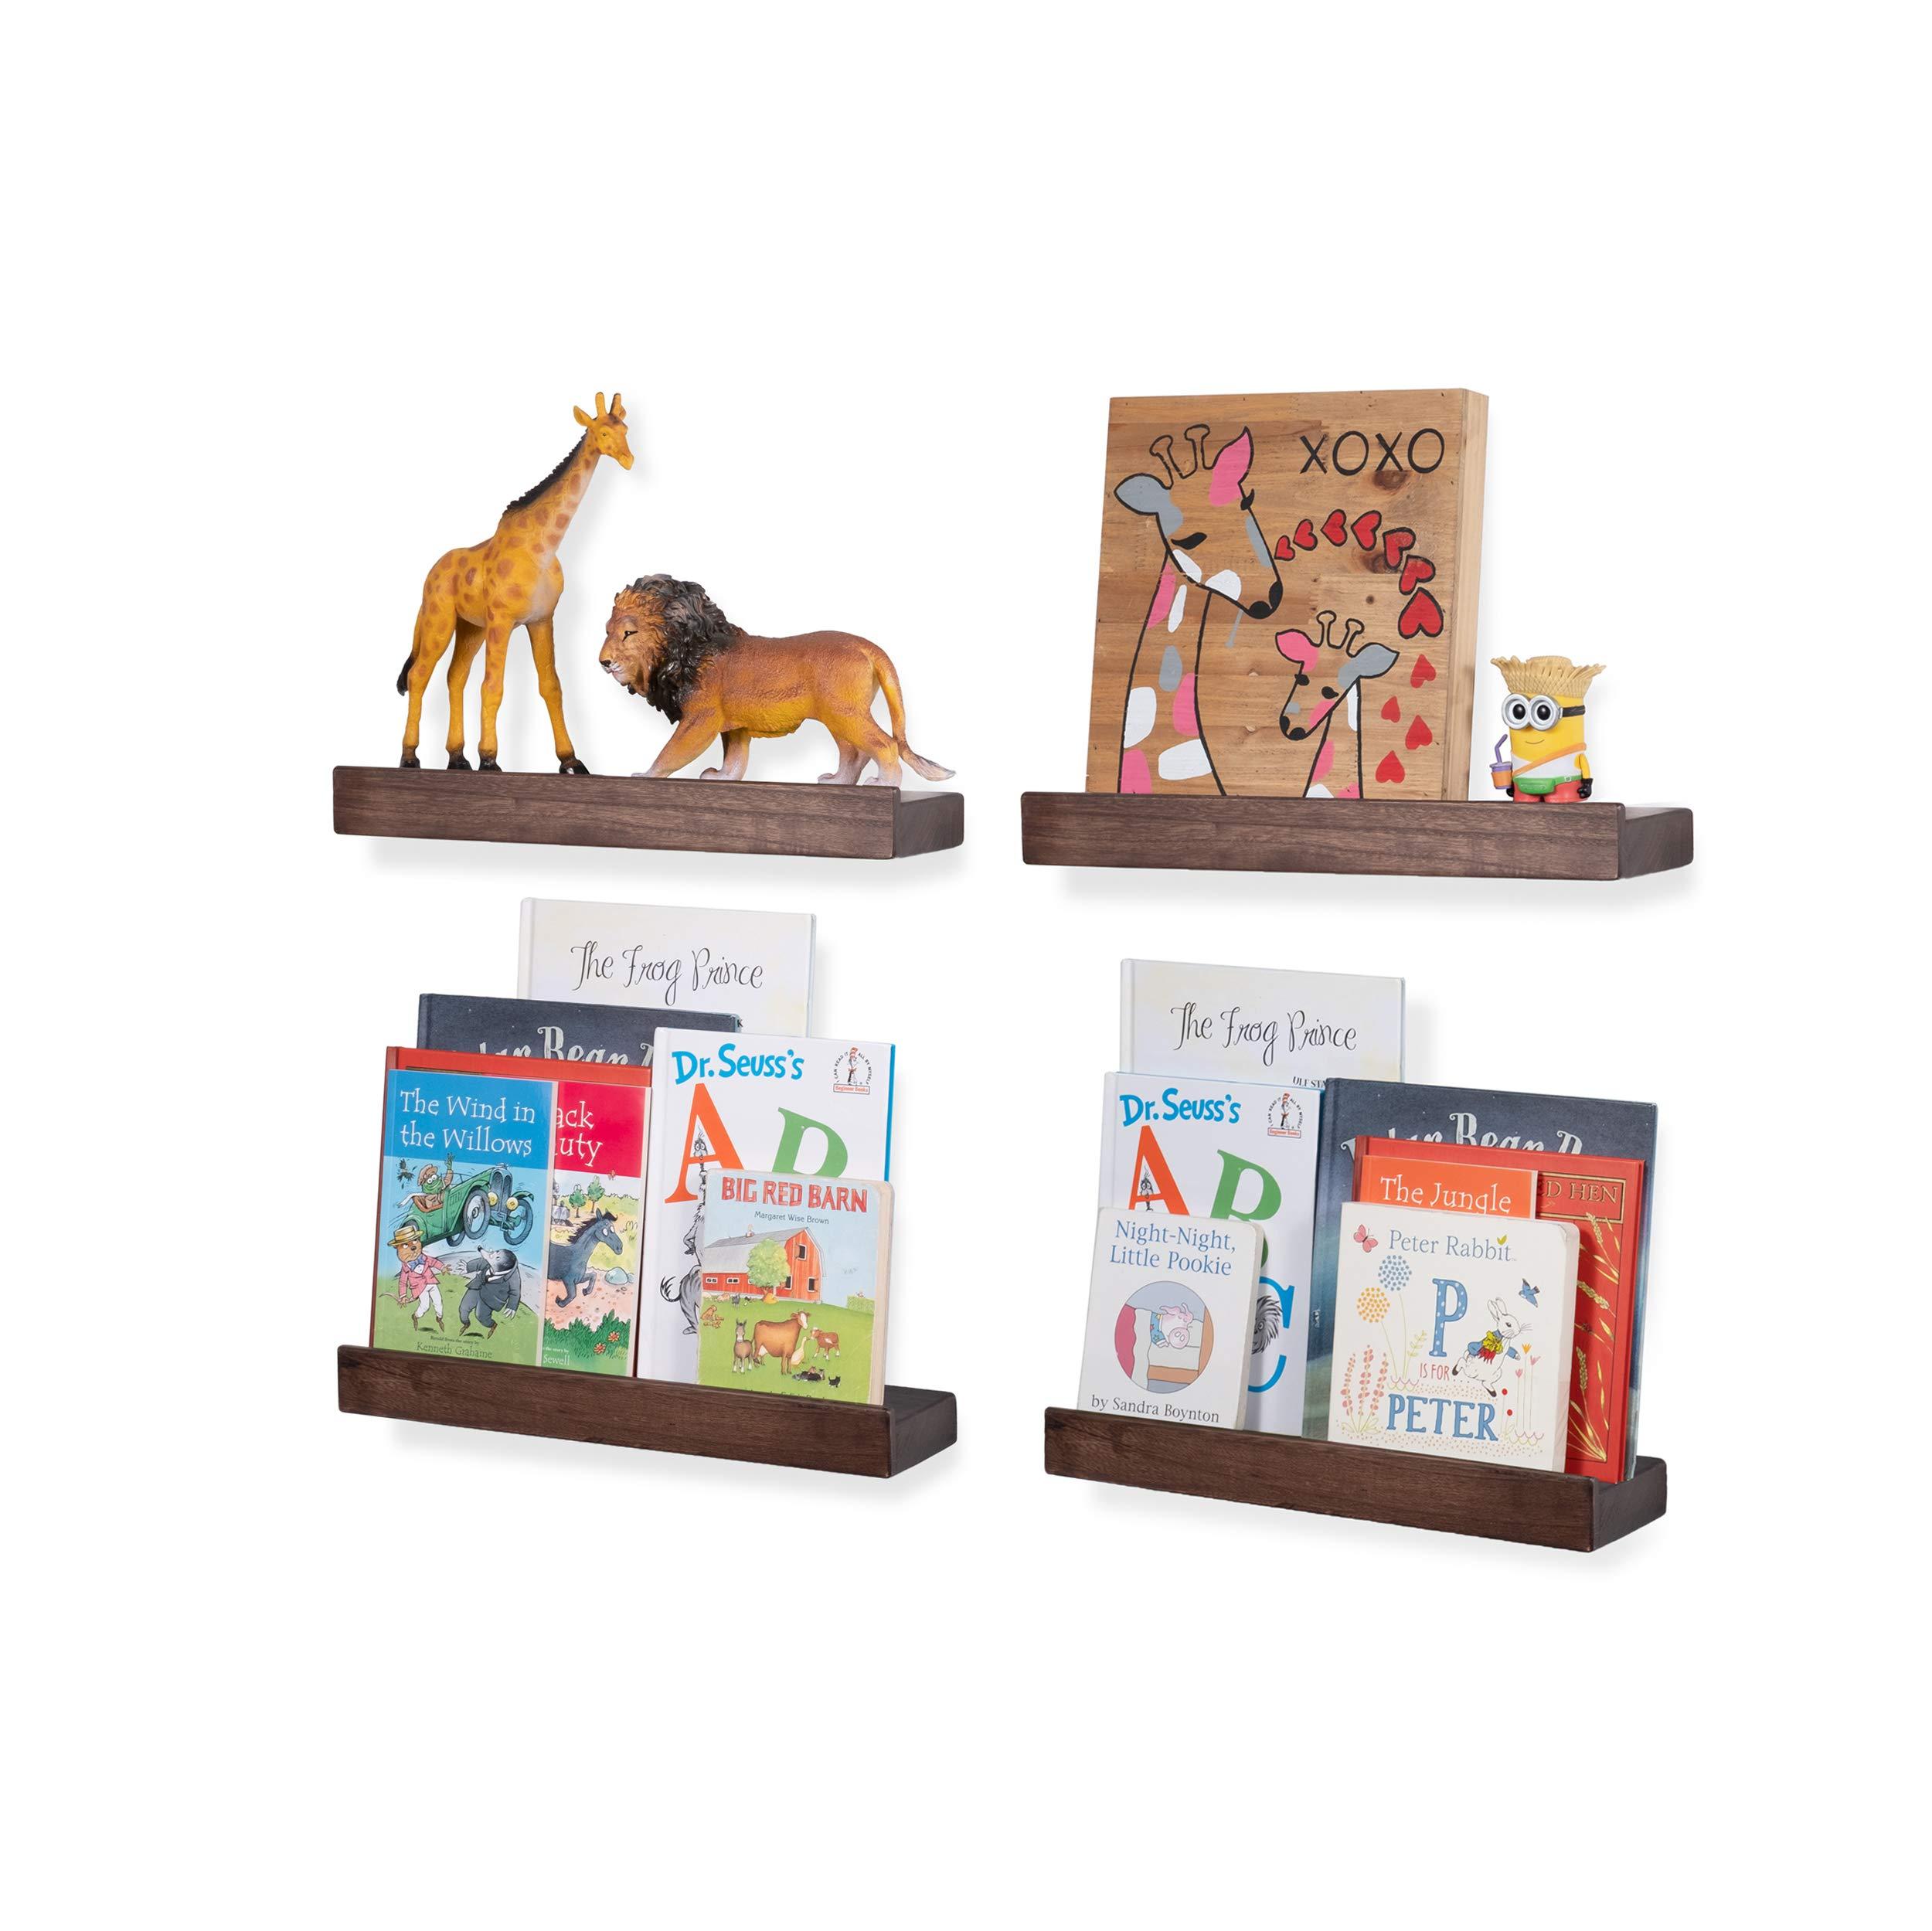 CDM product Rustic State Smith Wood Baby Nursery Kids Room Bookshelf | 16.60 Inch Farmhouse Decor Picture Ledge Shelves Display Walnut Set of 4 big image